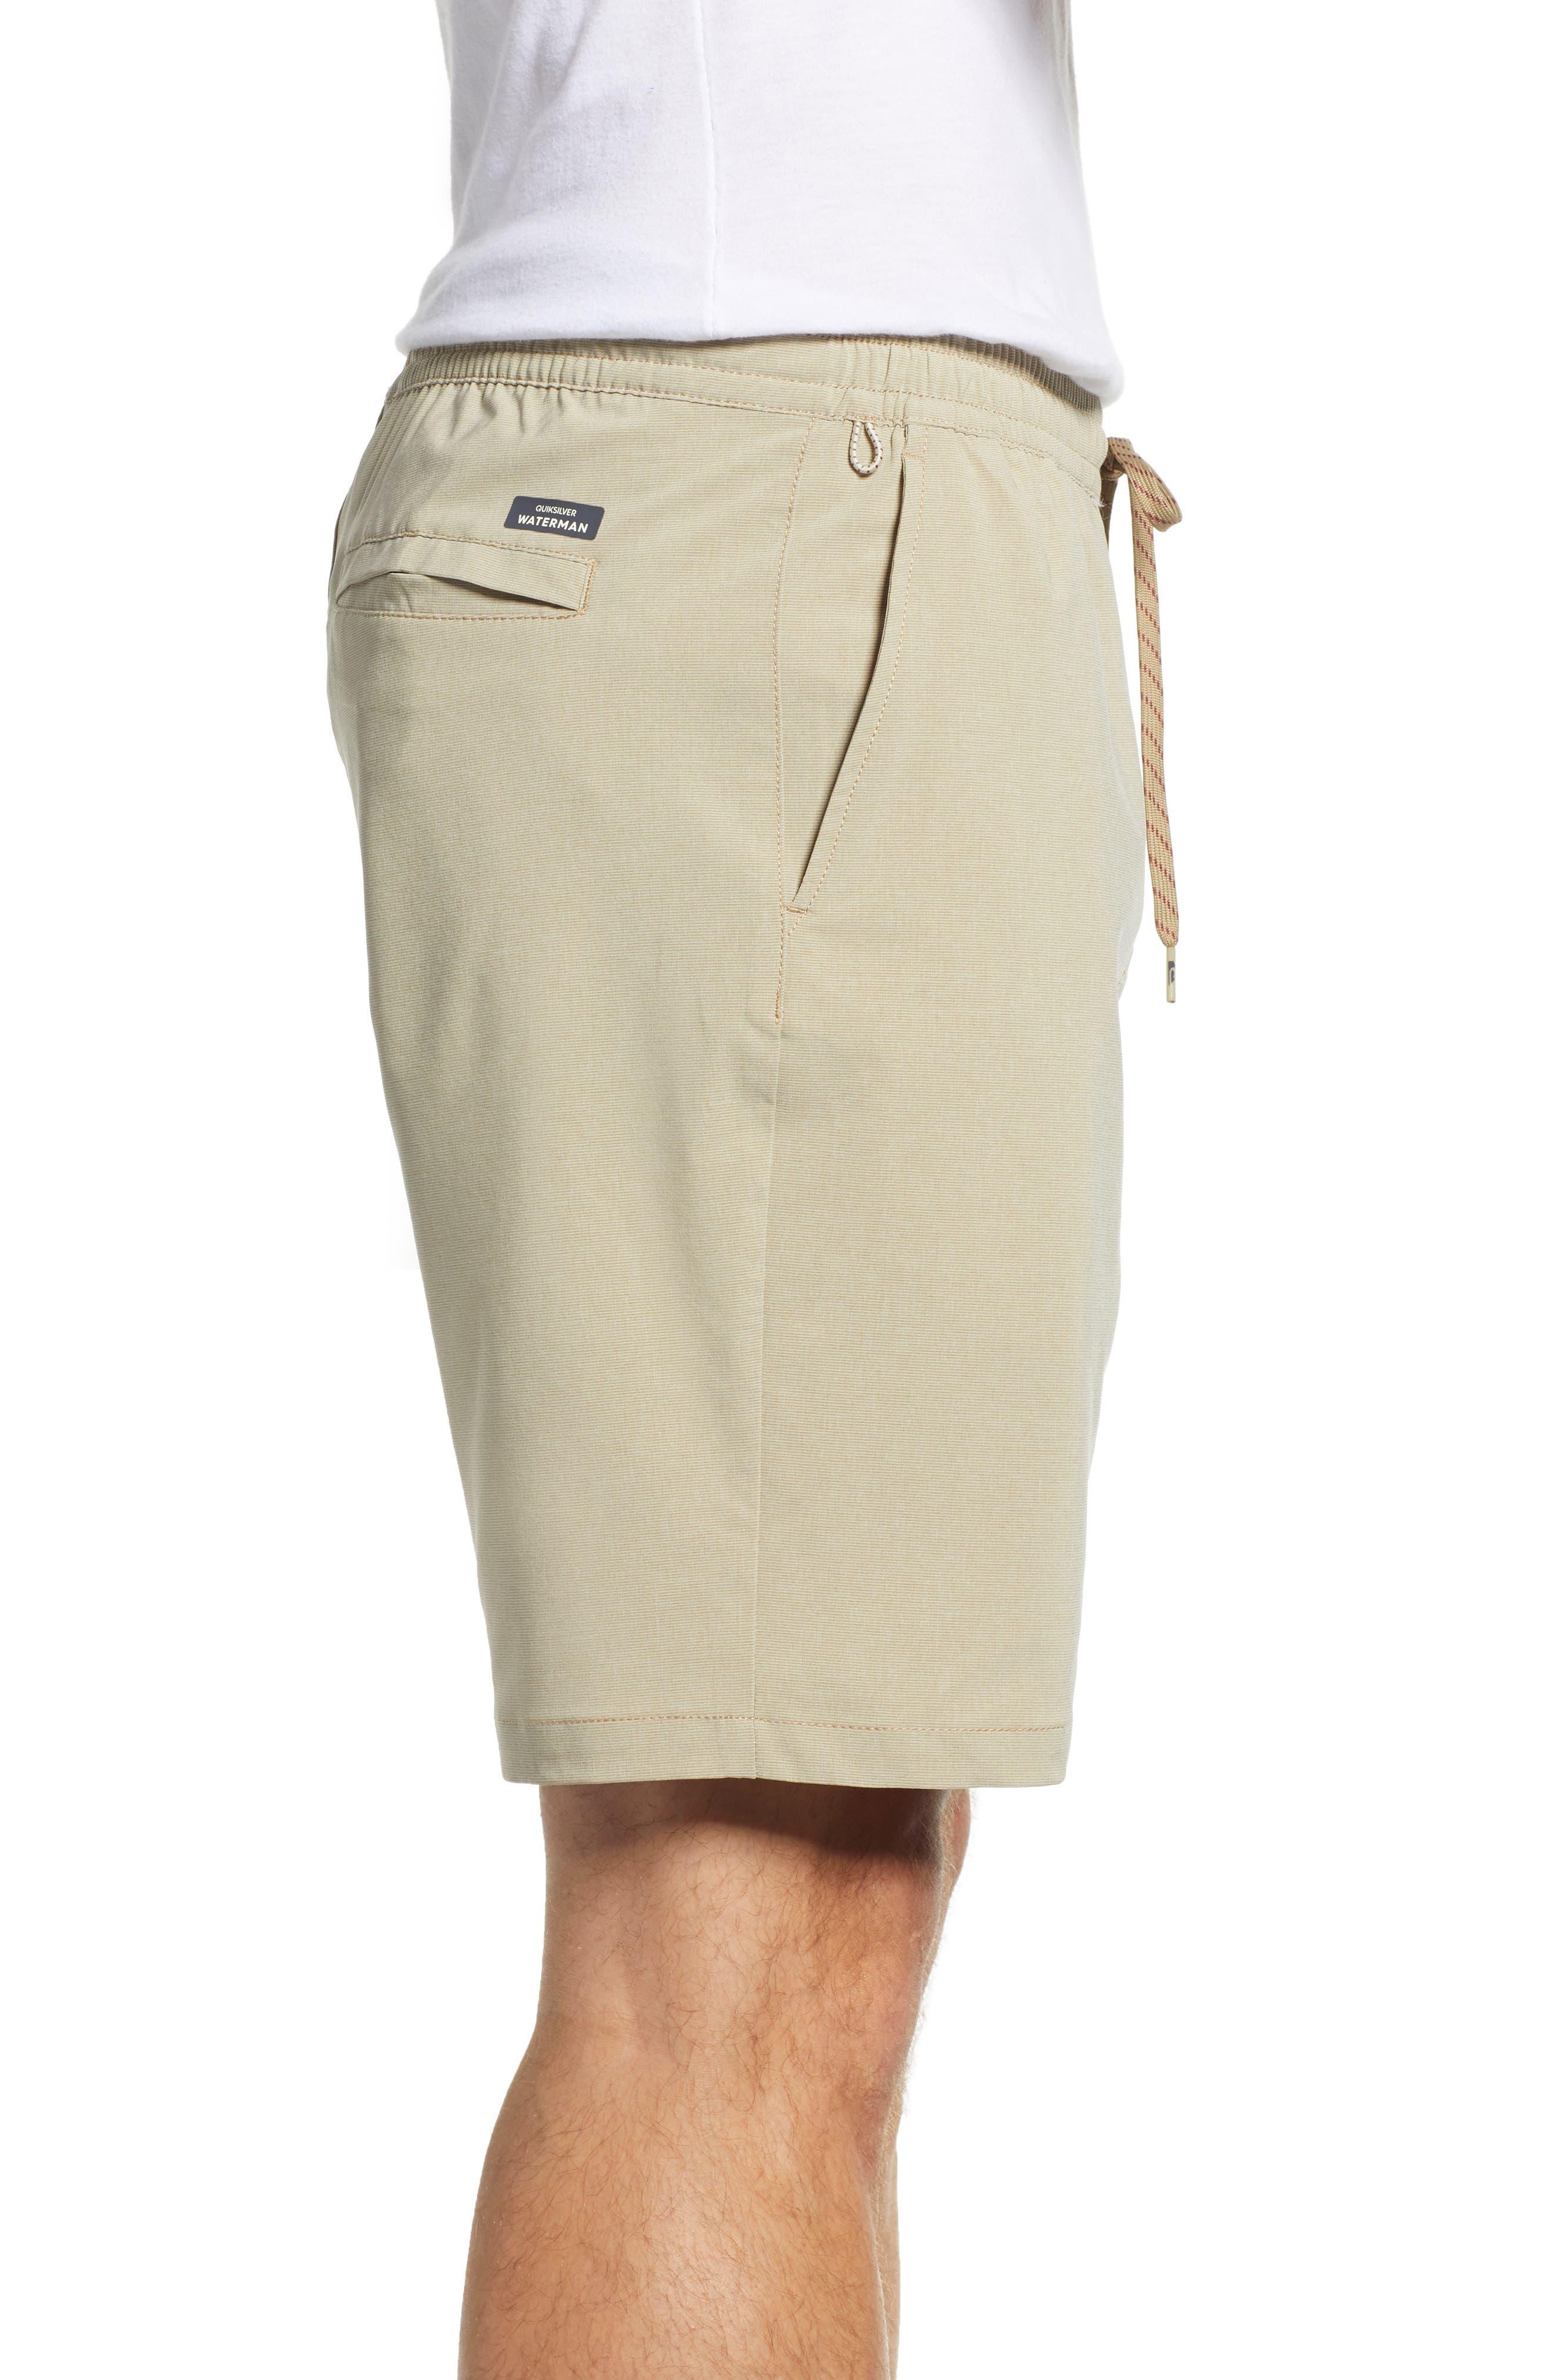 QUIKSILVER WATERMAN COLLECTION,                             Suva Amphibian Hybrid Shorts,                             Alternate thumbnail 3, color,                             TWILL